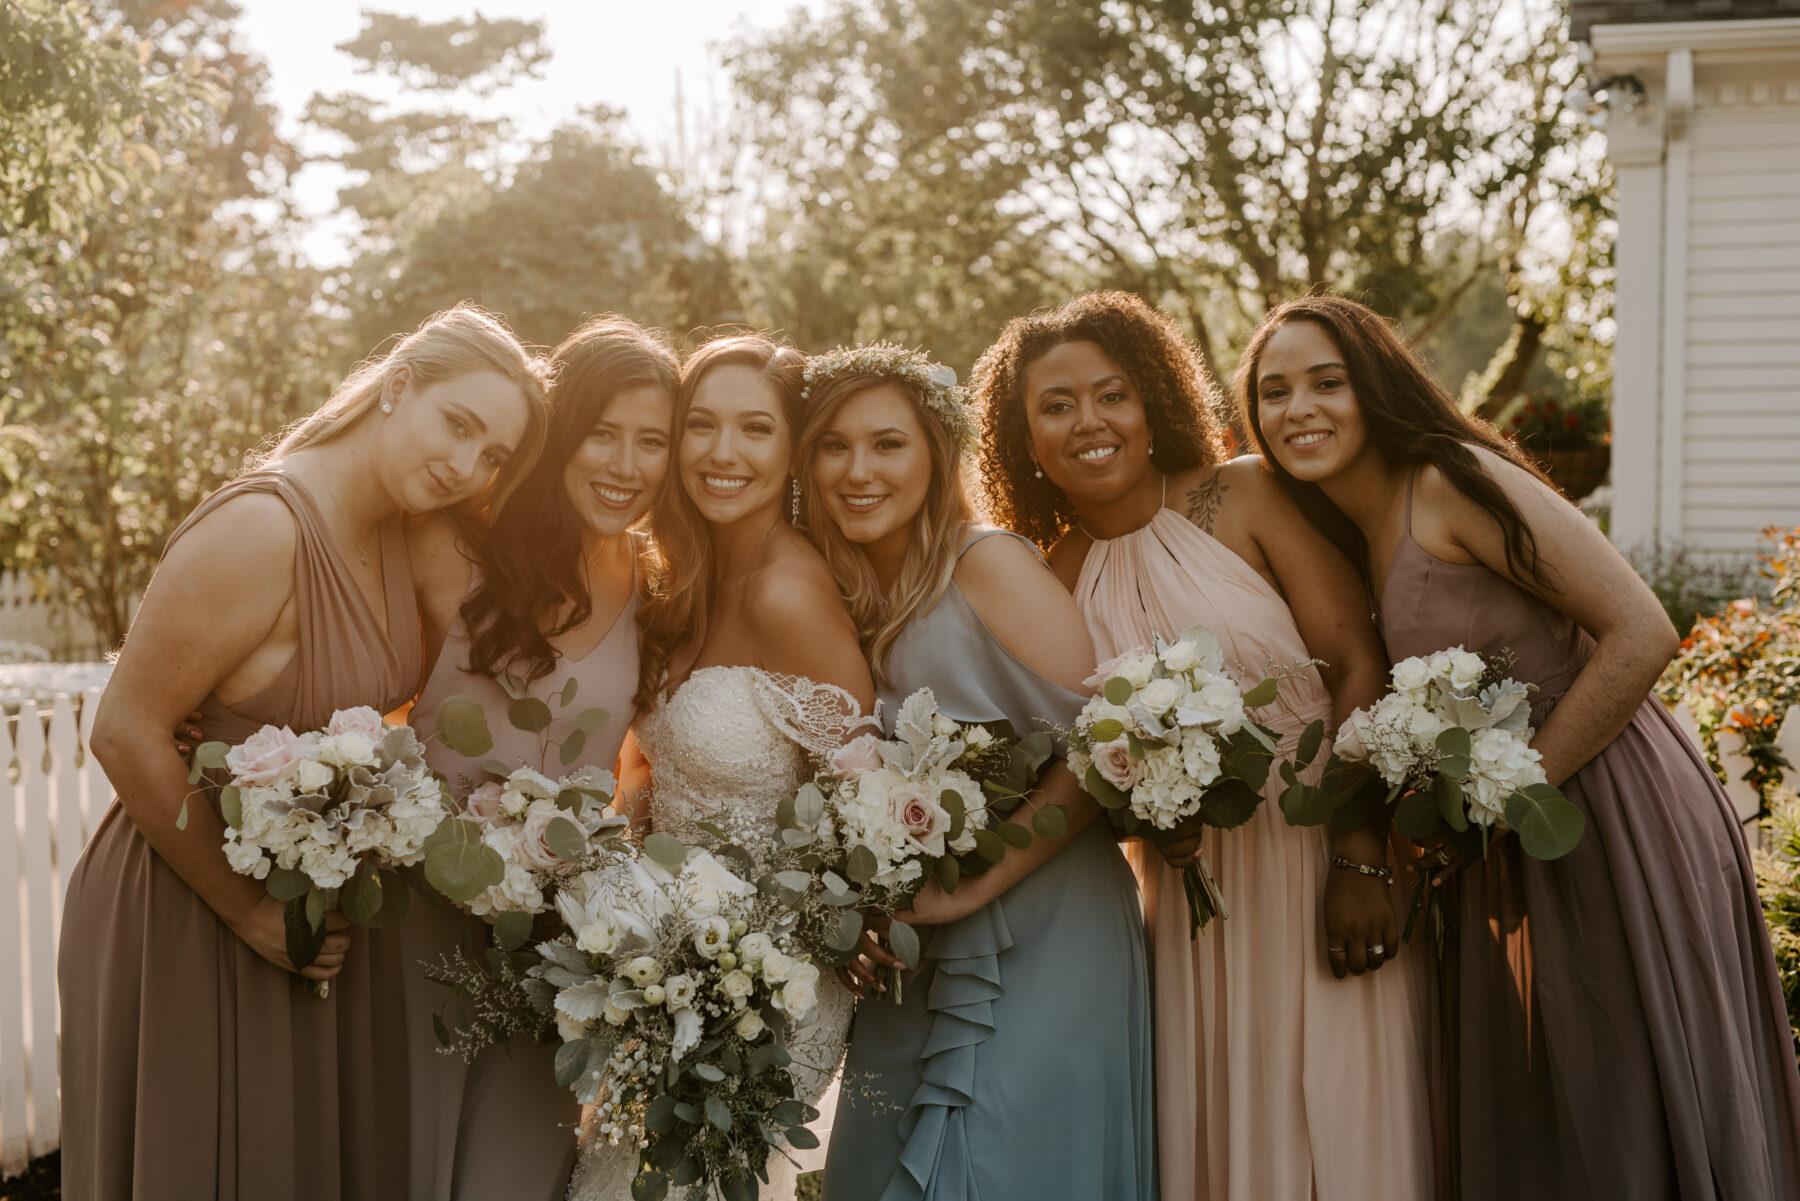 Five Bridge Inn Rehoboth Wedding Katie and Enrique Blueflash Photography 10